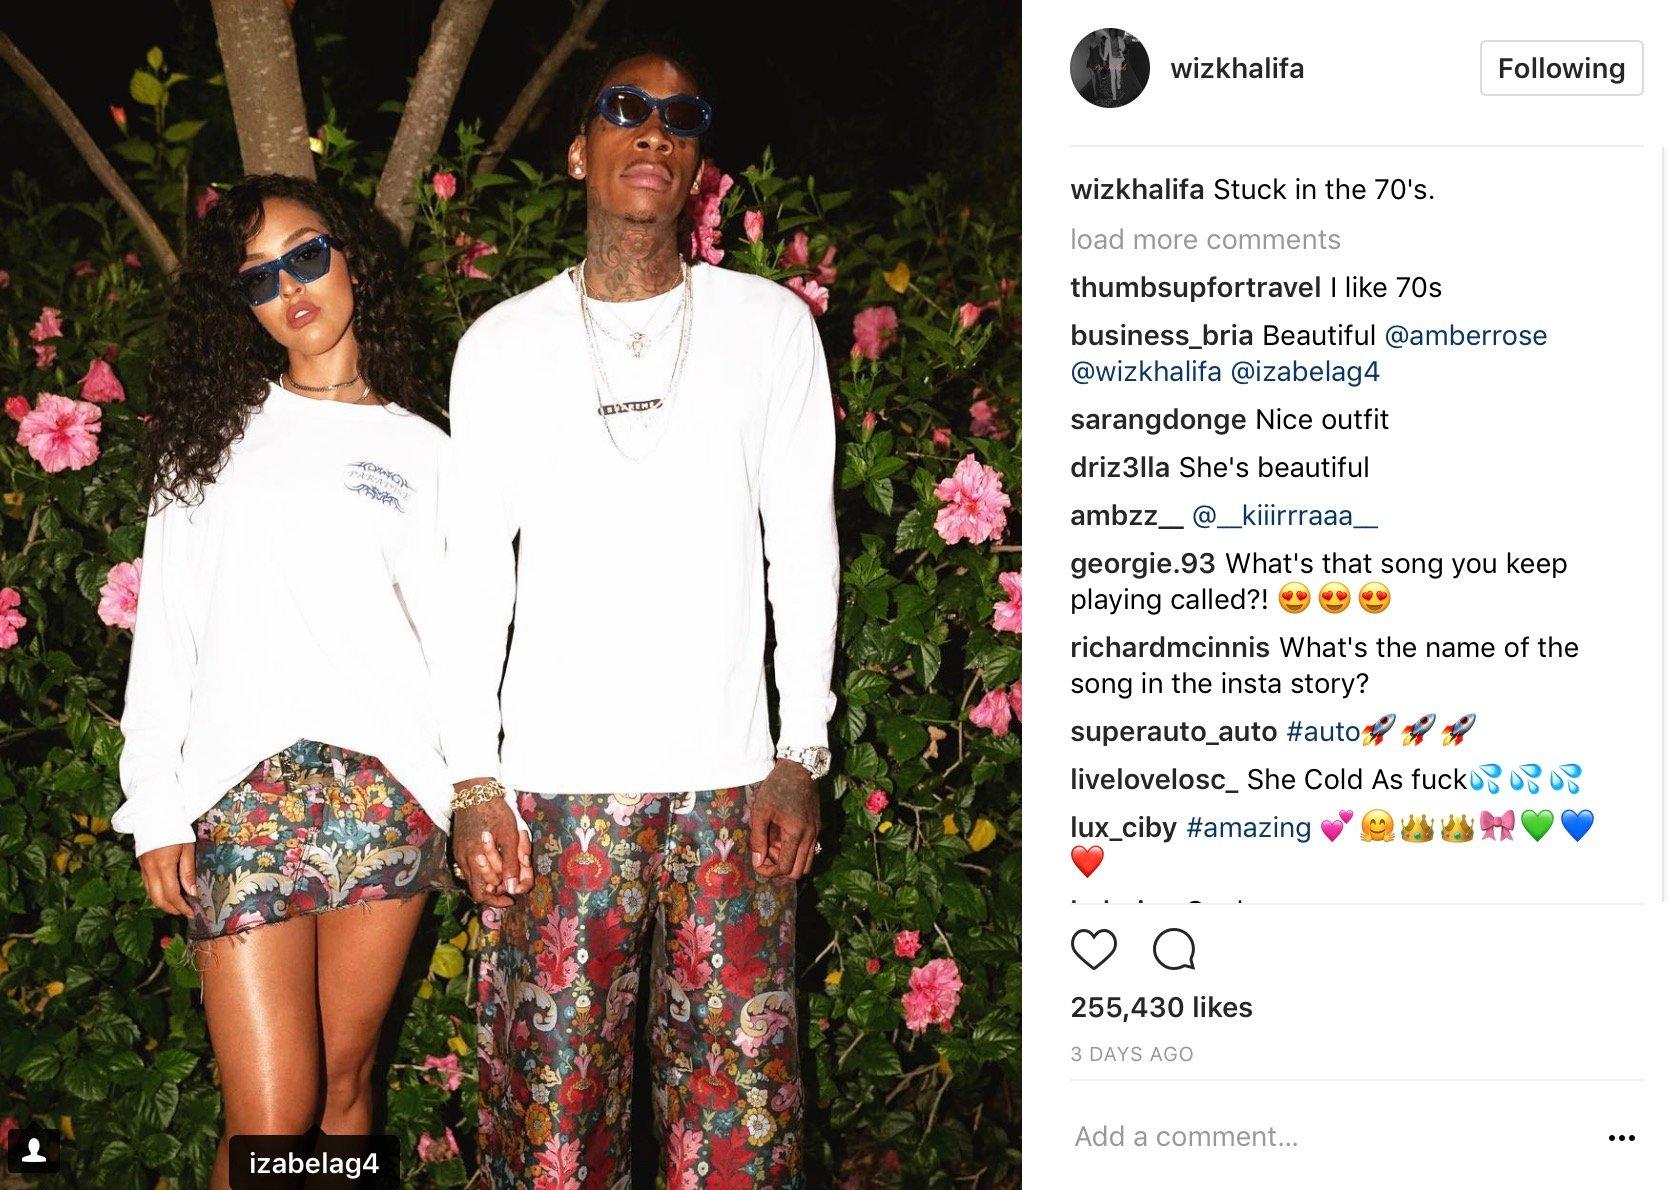 Wiz Khalifa Isn't Letting His Bae Outta Sight Anytime Soon